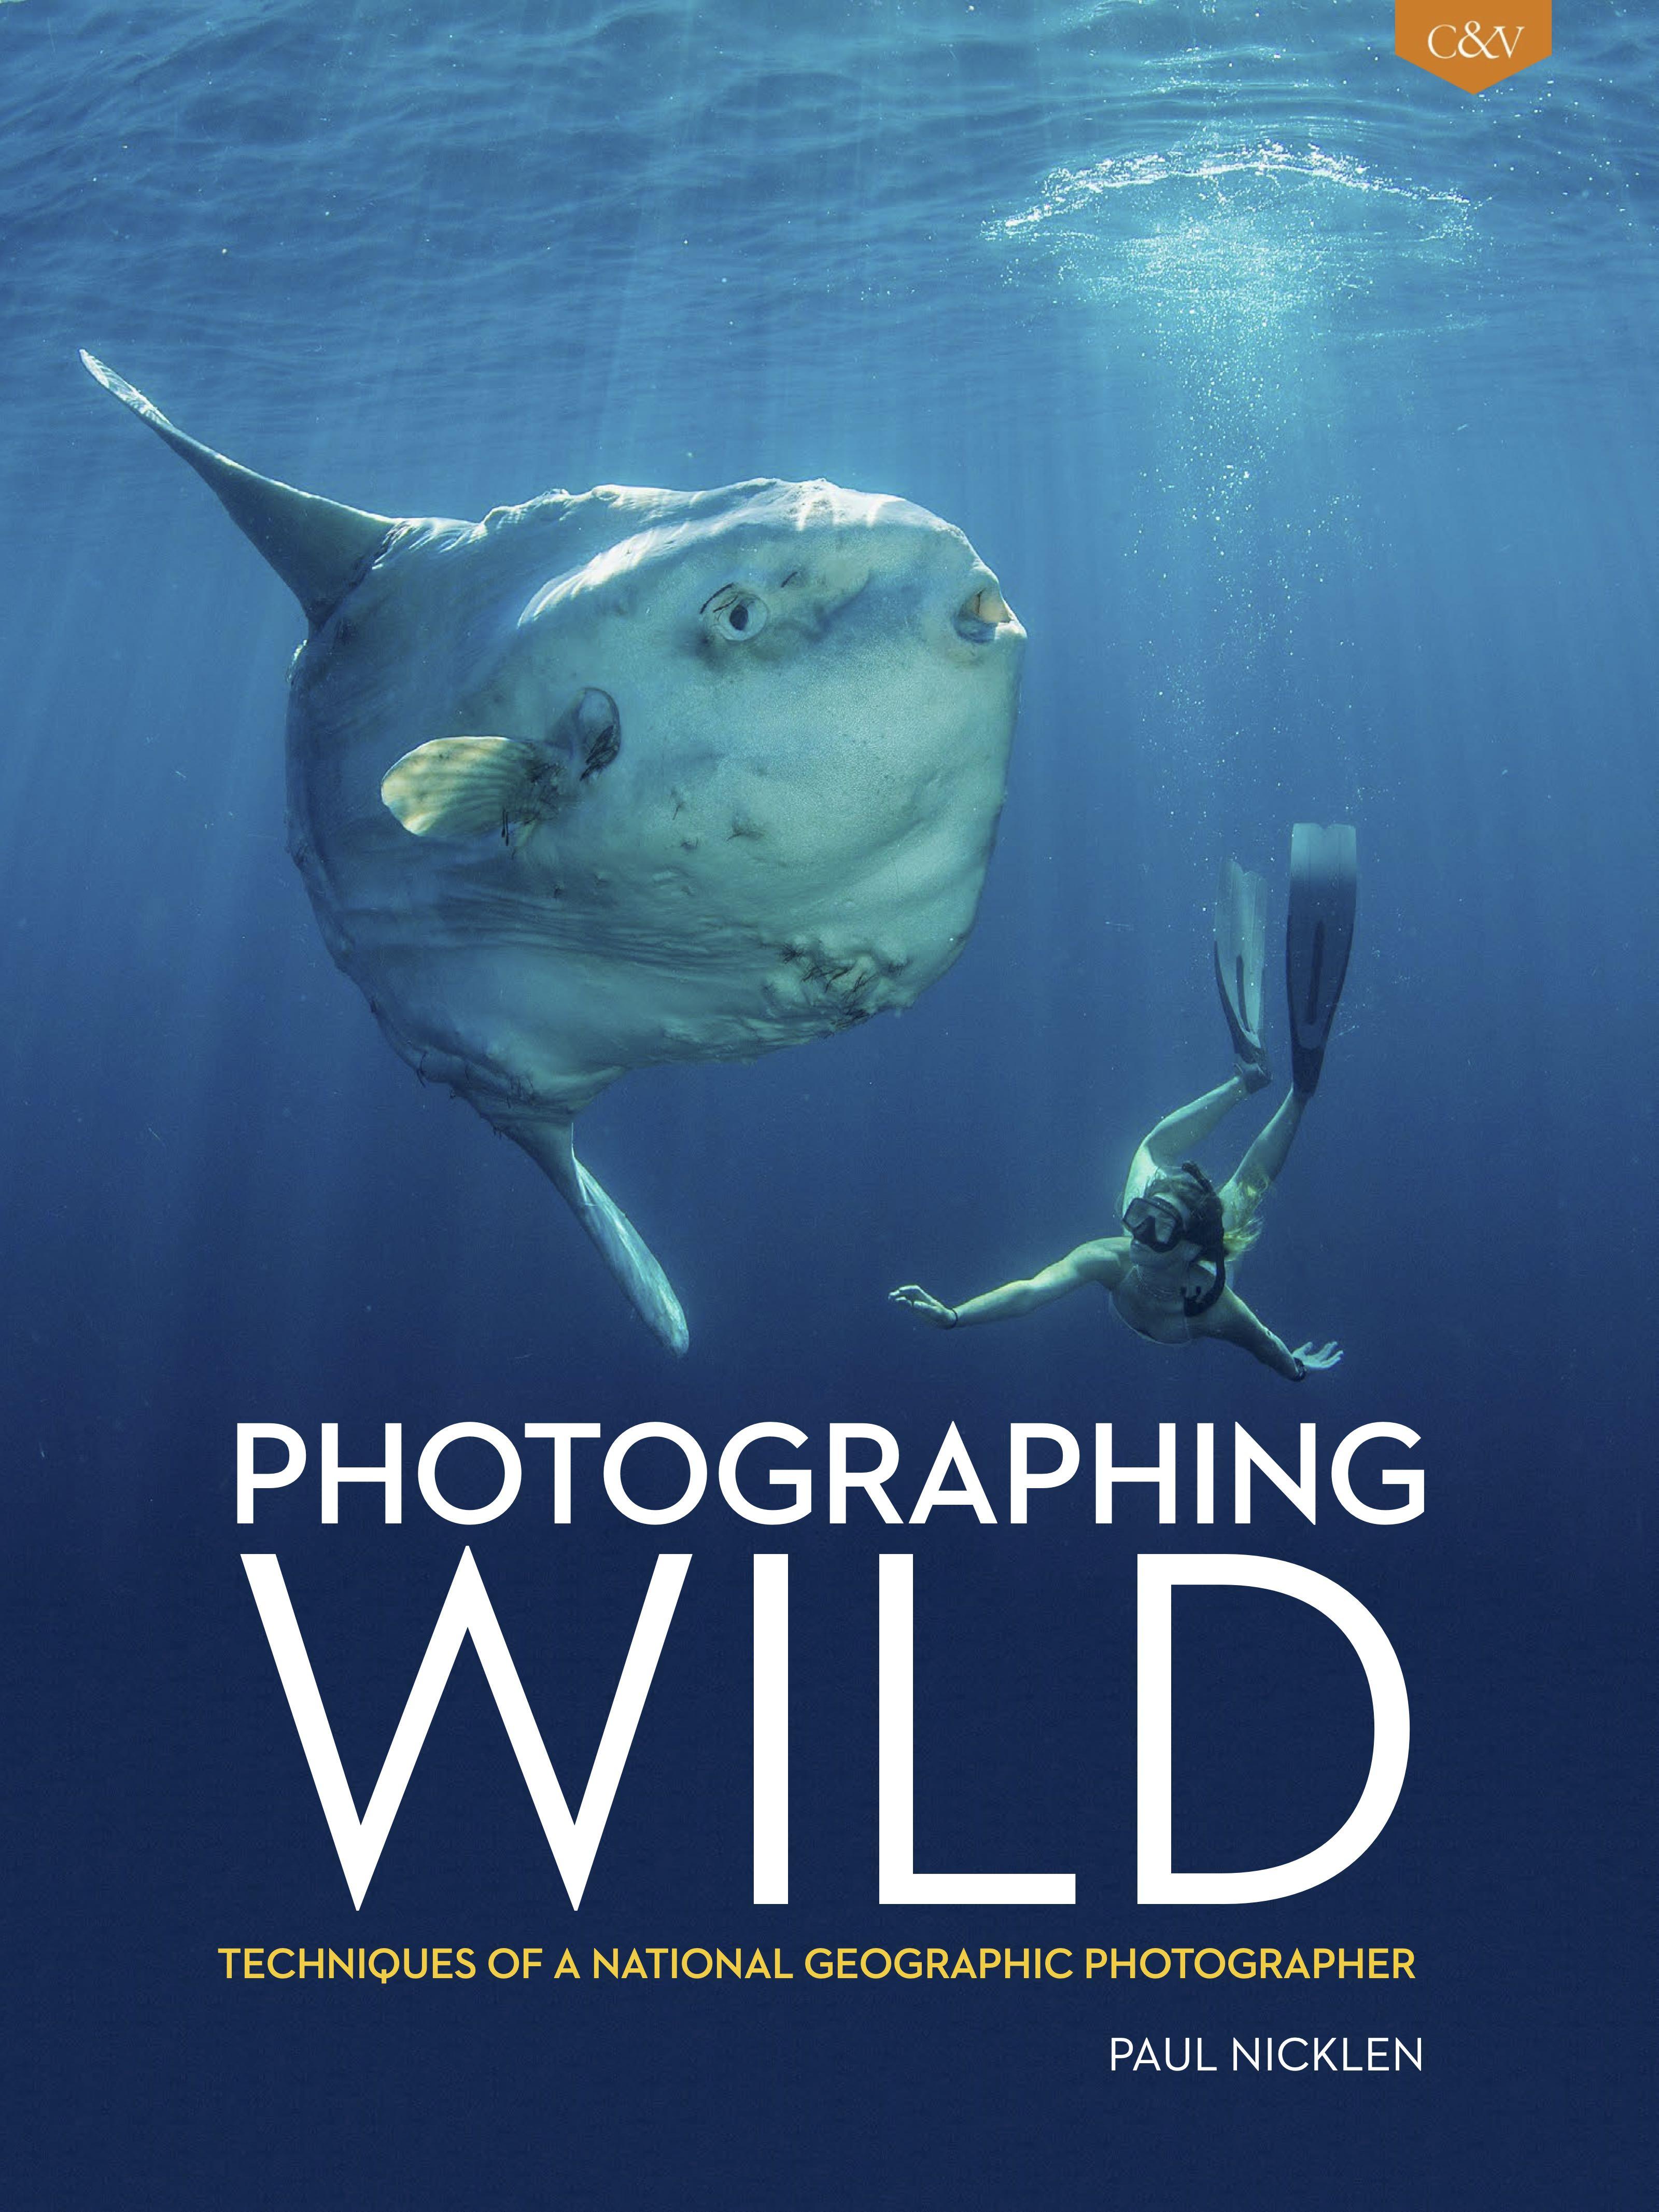 Photographing Wild